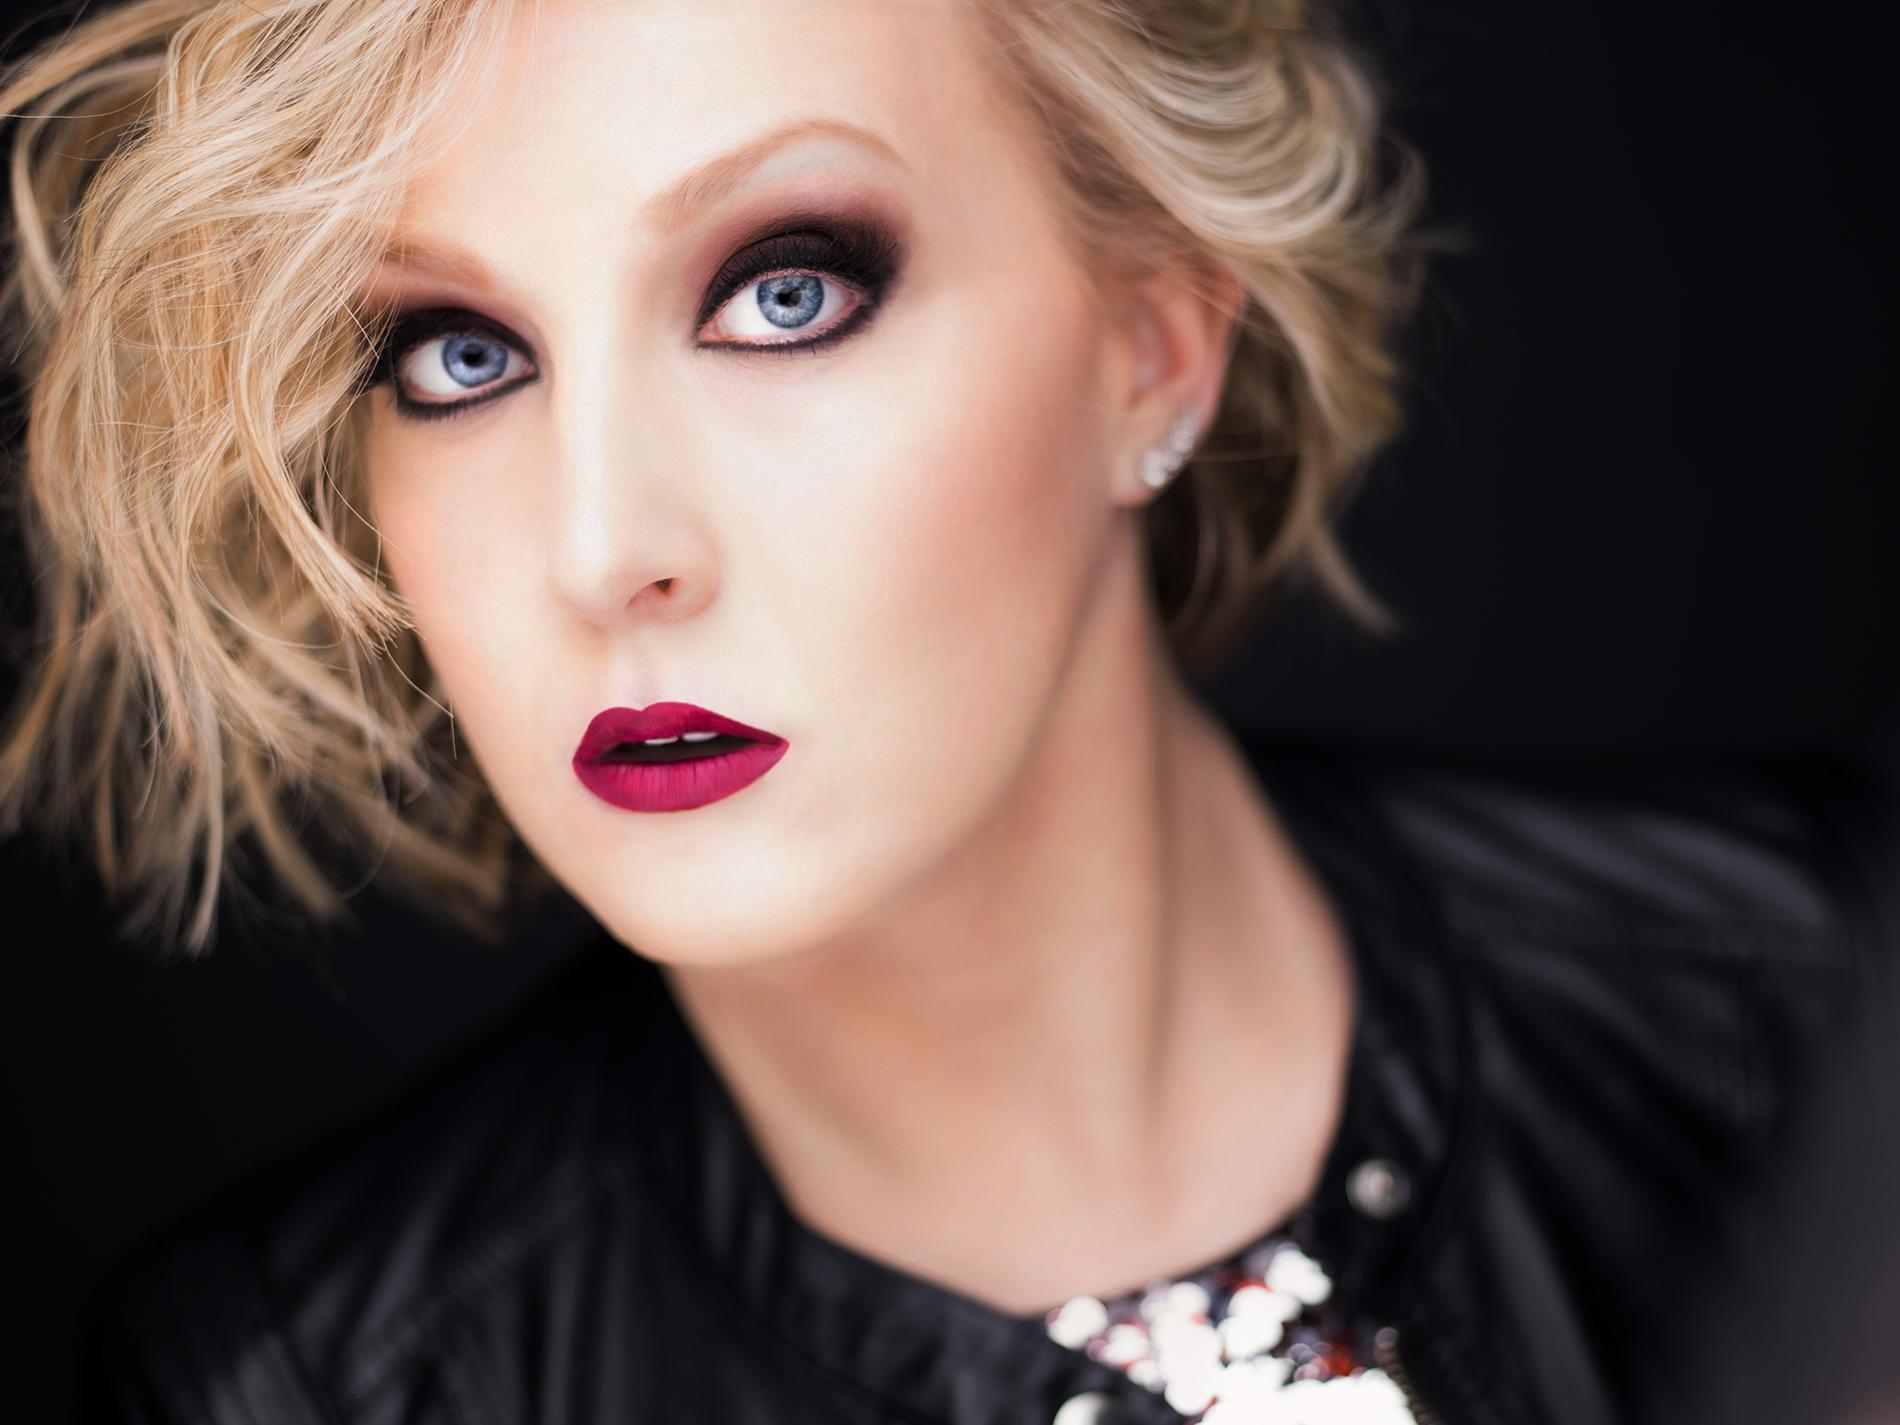 Lindsay Ammann Dramatic Mezzo/Contralto Photo: Rod Evans